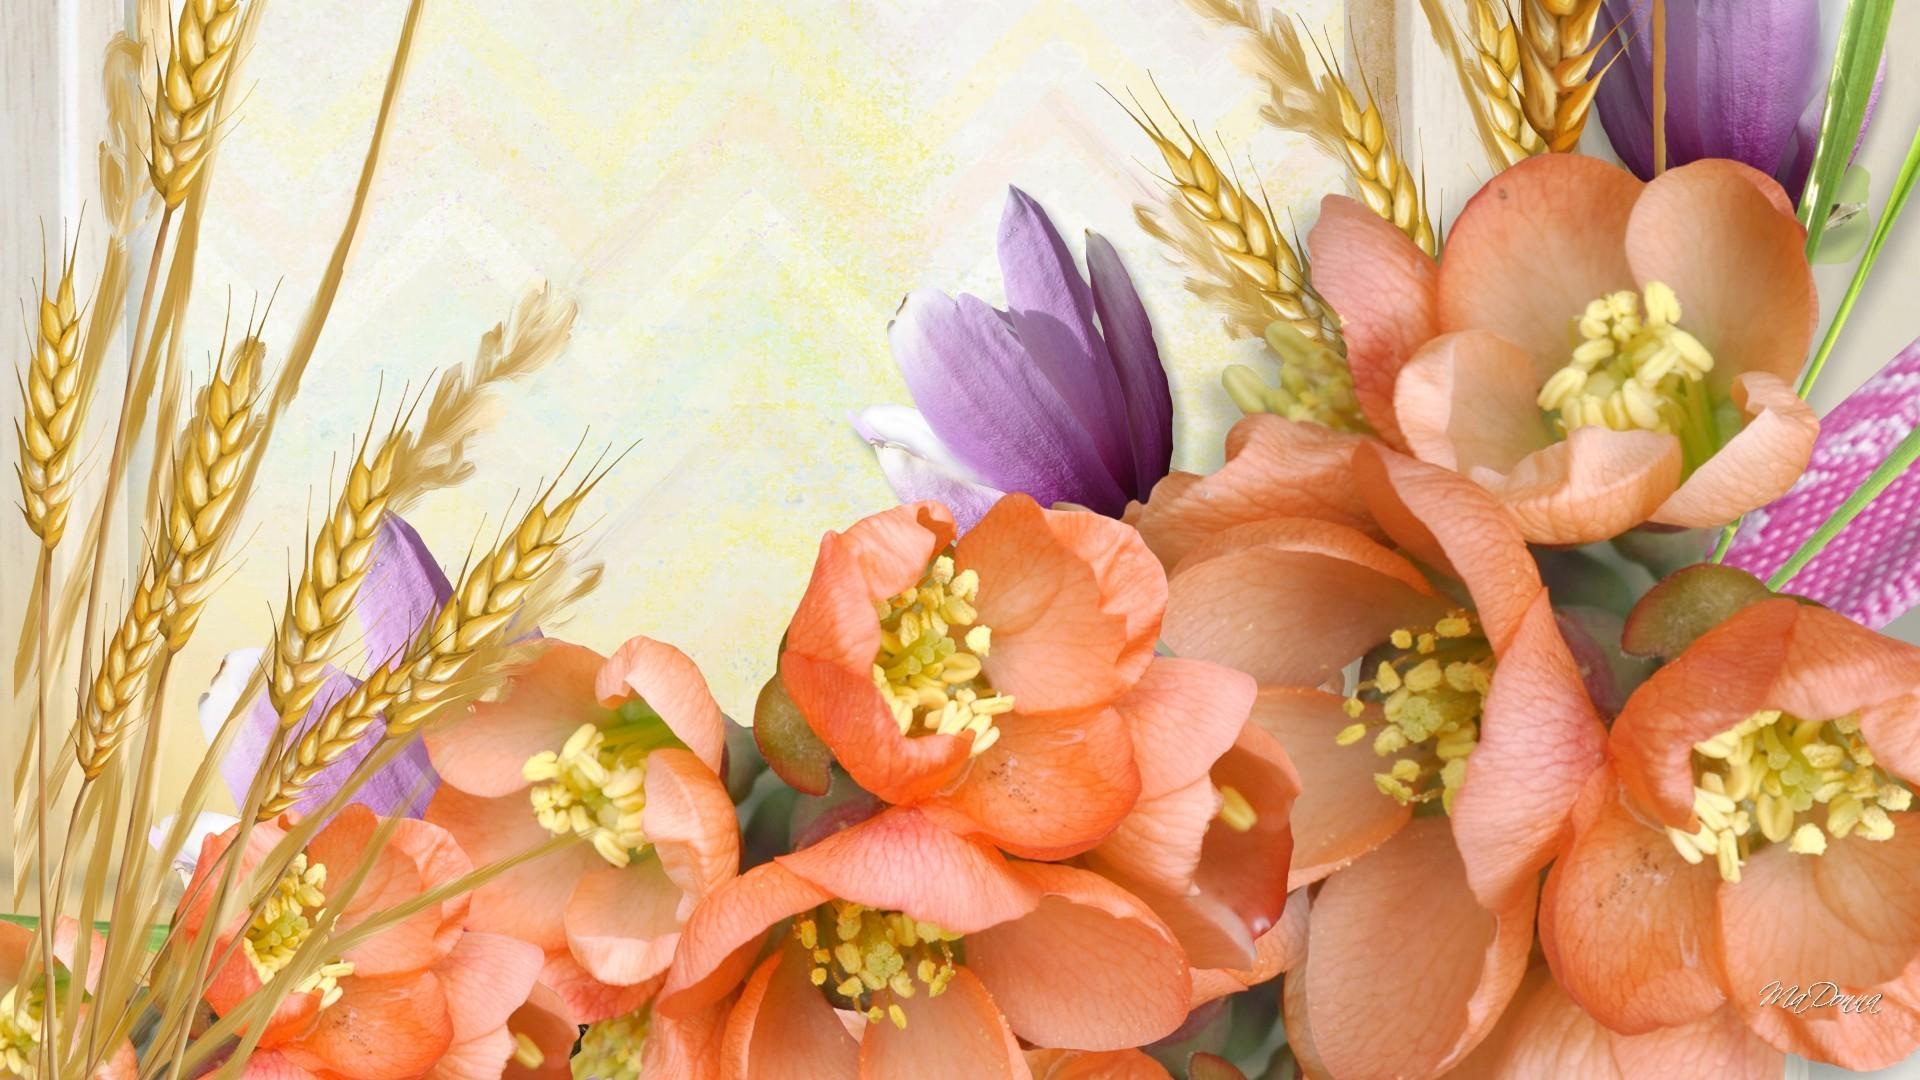 Grains Tag – Miracle Nature Flowers Autumn Peach Grass Lavender Wheat  Summer Fall Orange Oats Soft